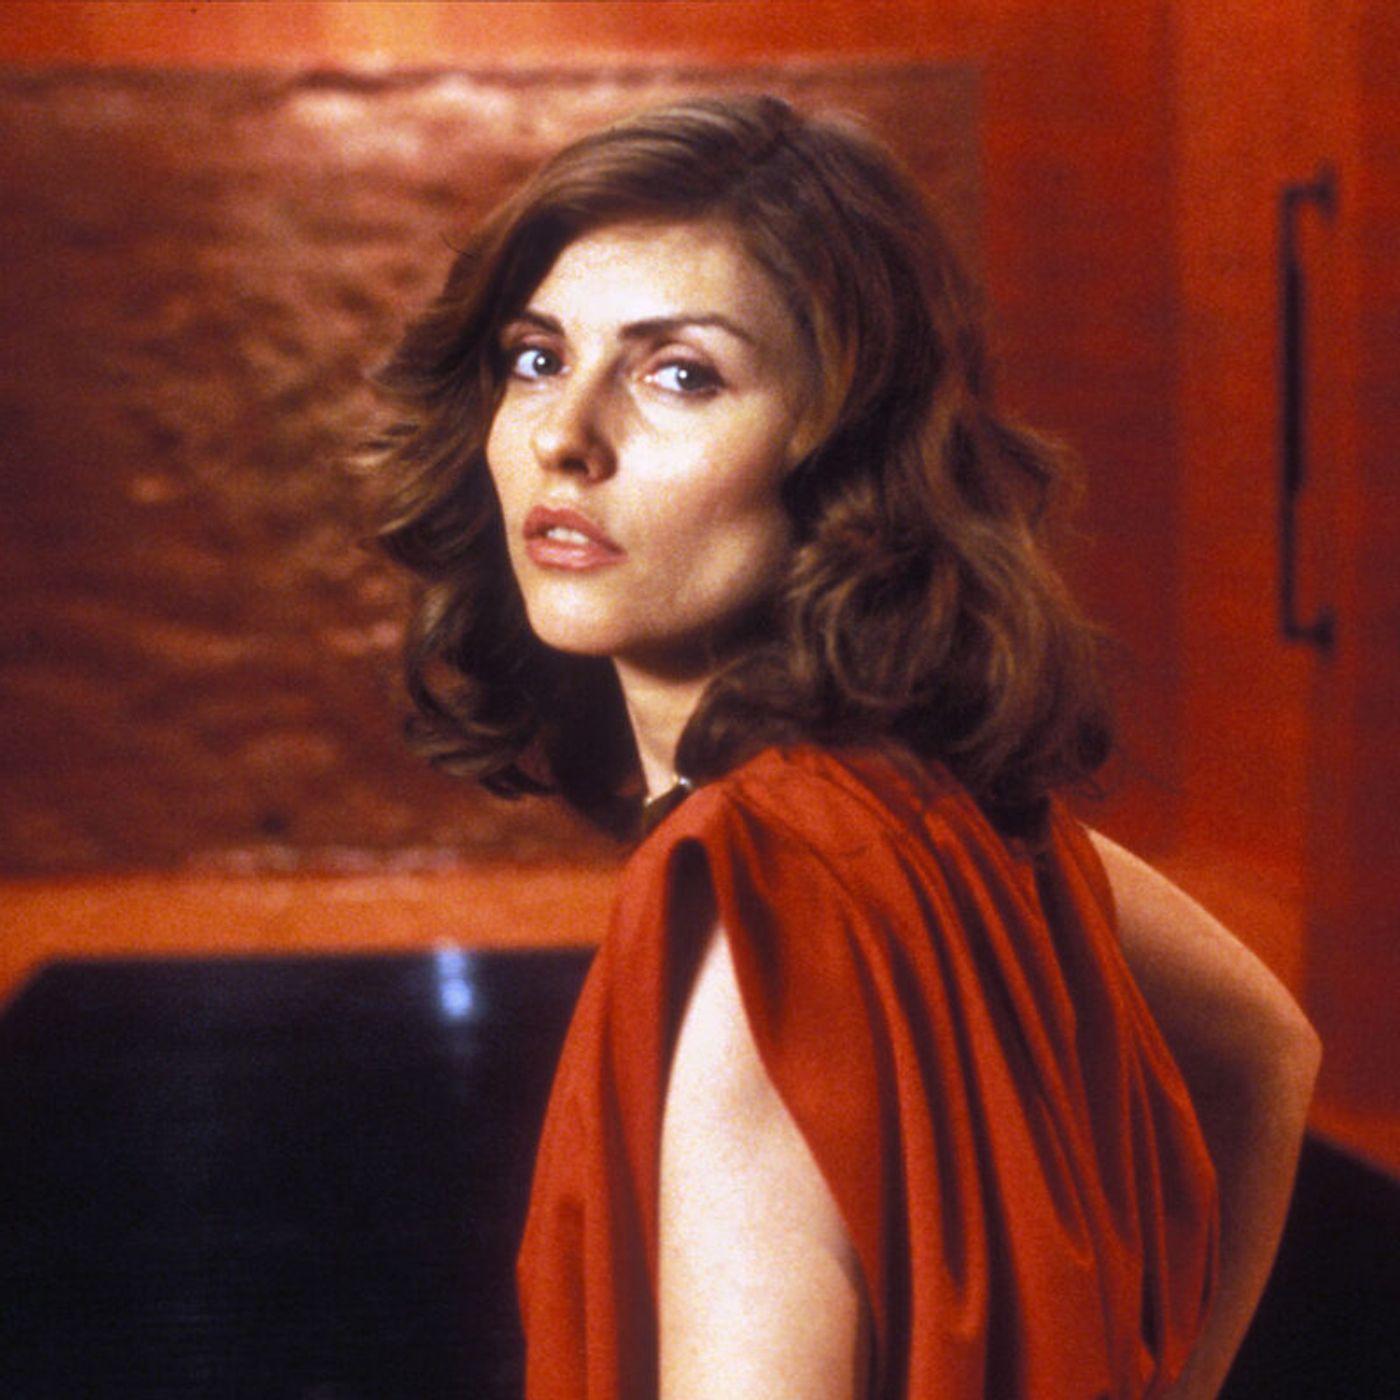 Season 5: Episode 209 - THE 80*s:  Scanners (1981) / Videodrome (1983)